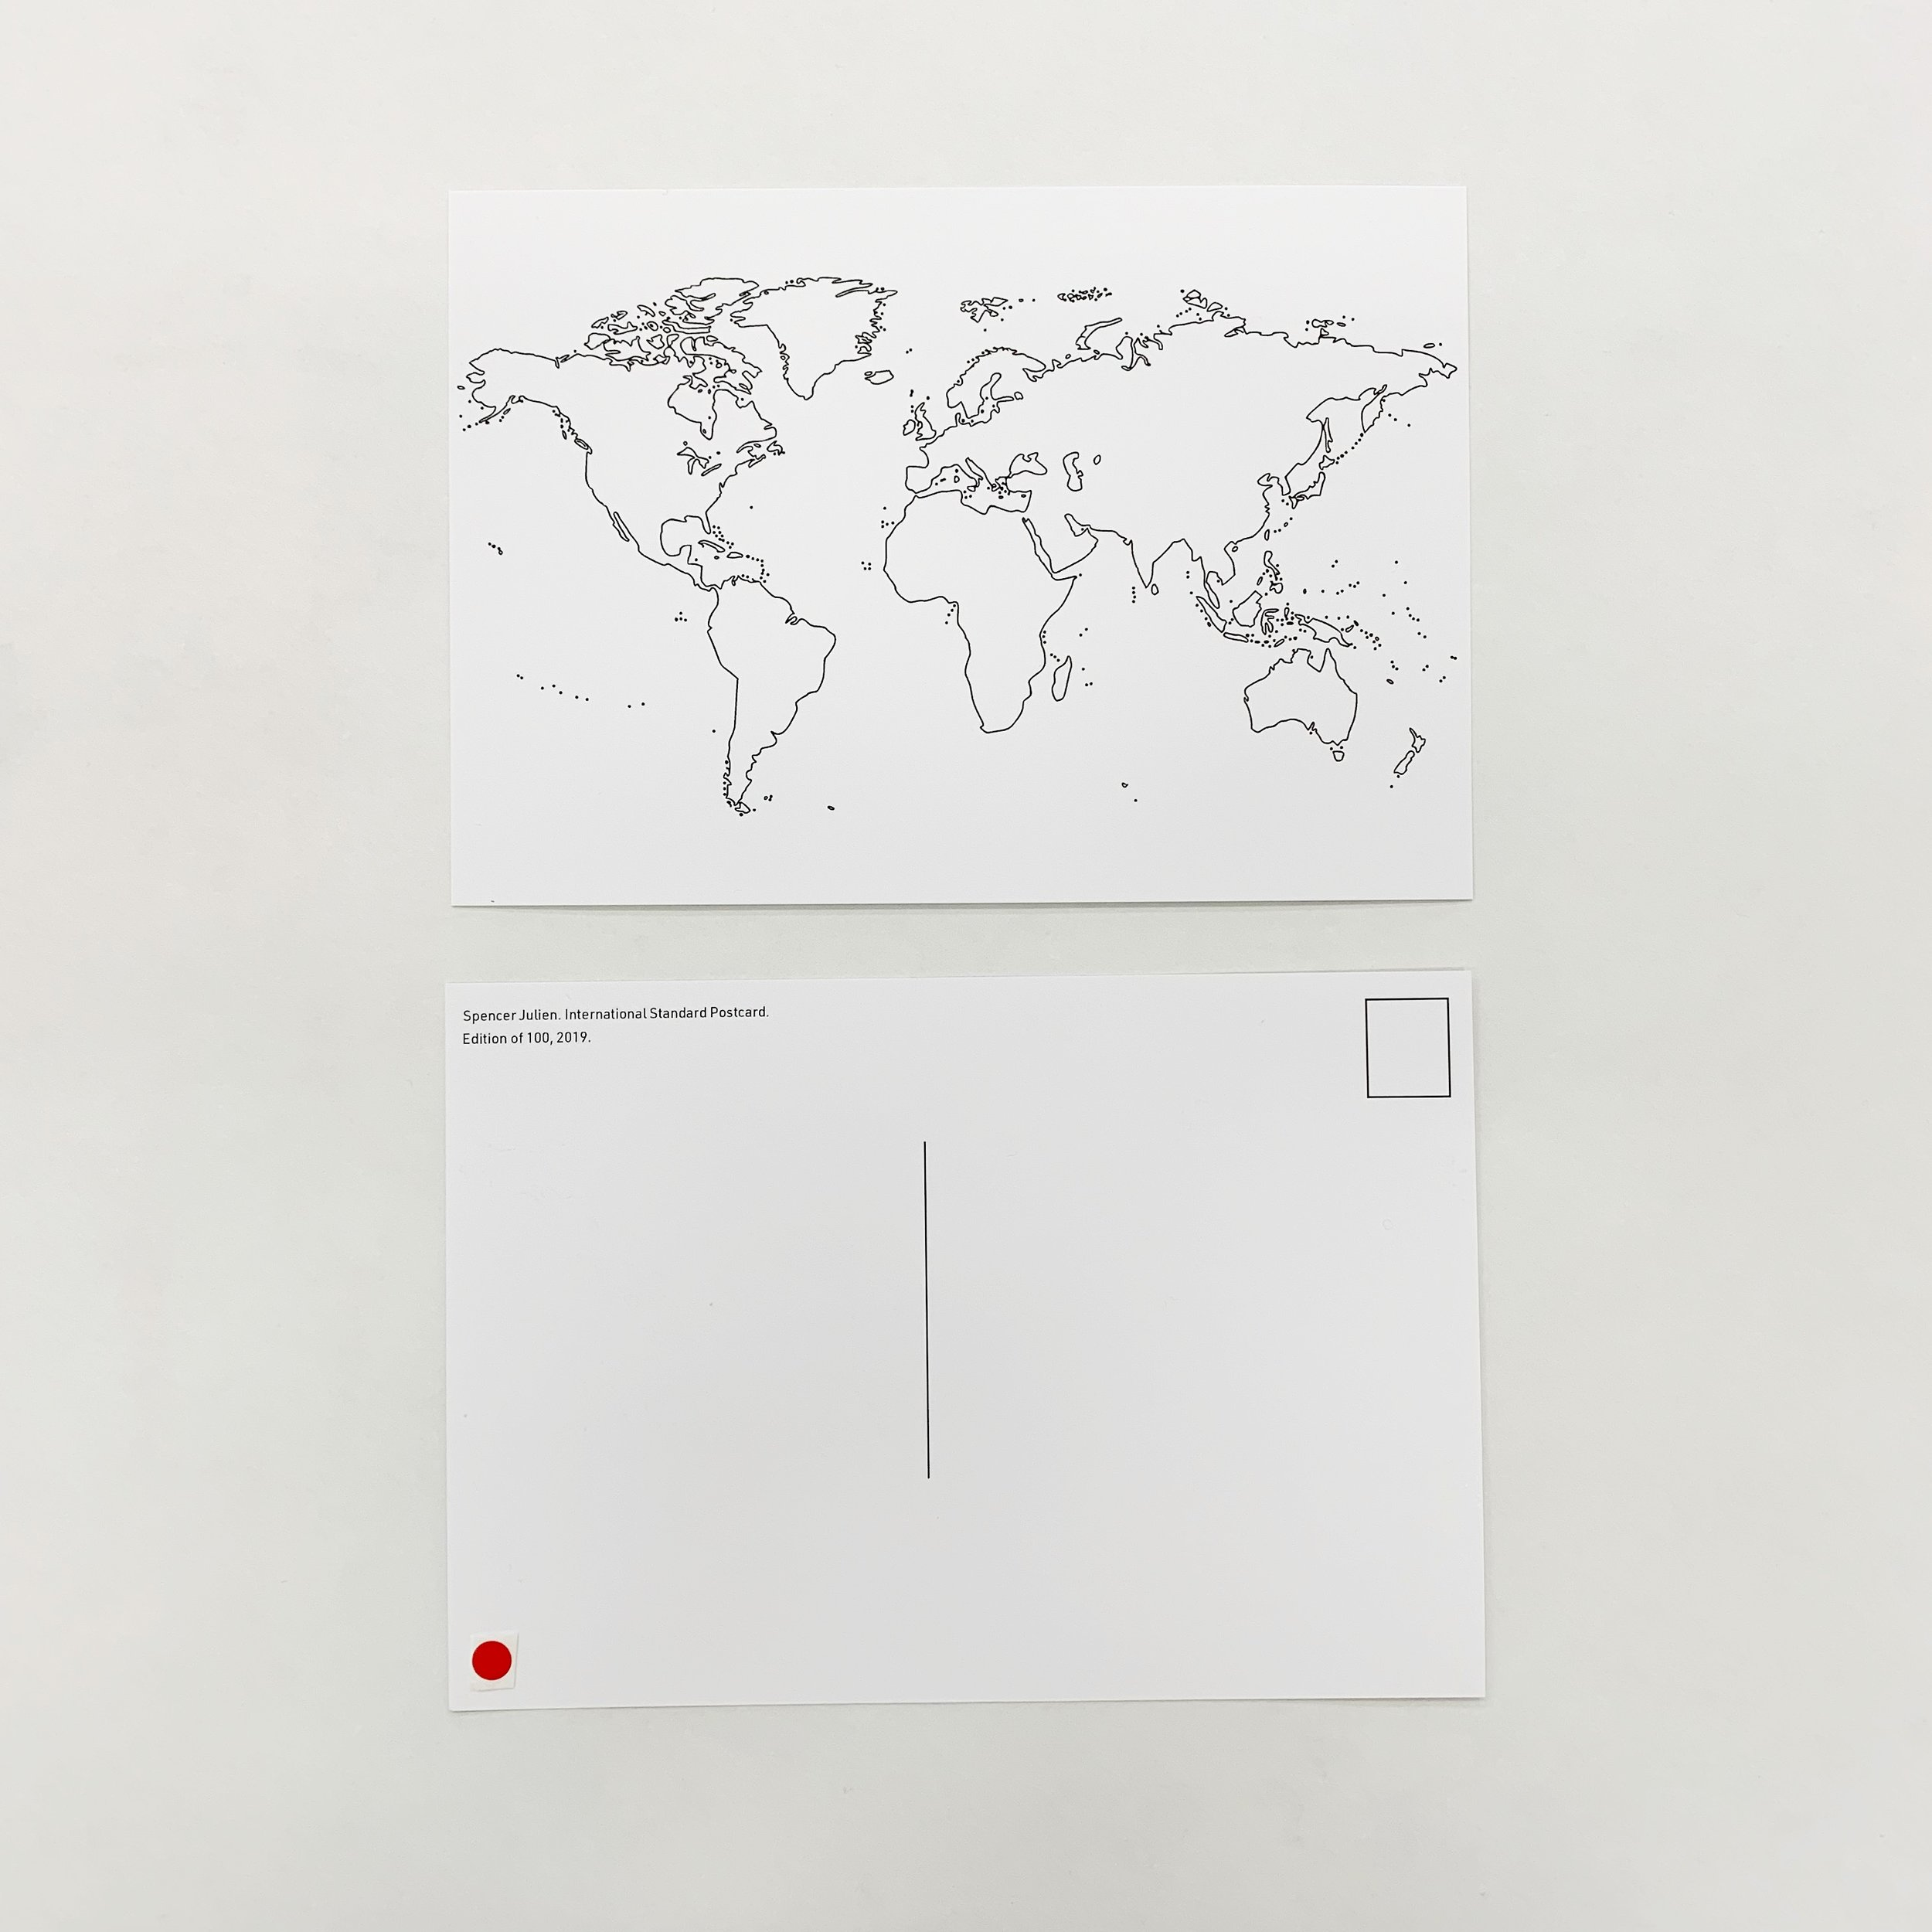 International Standard Postcard, 2019